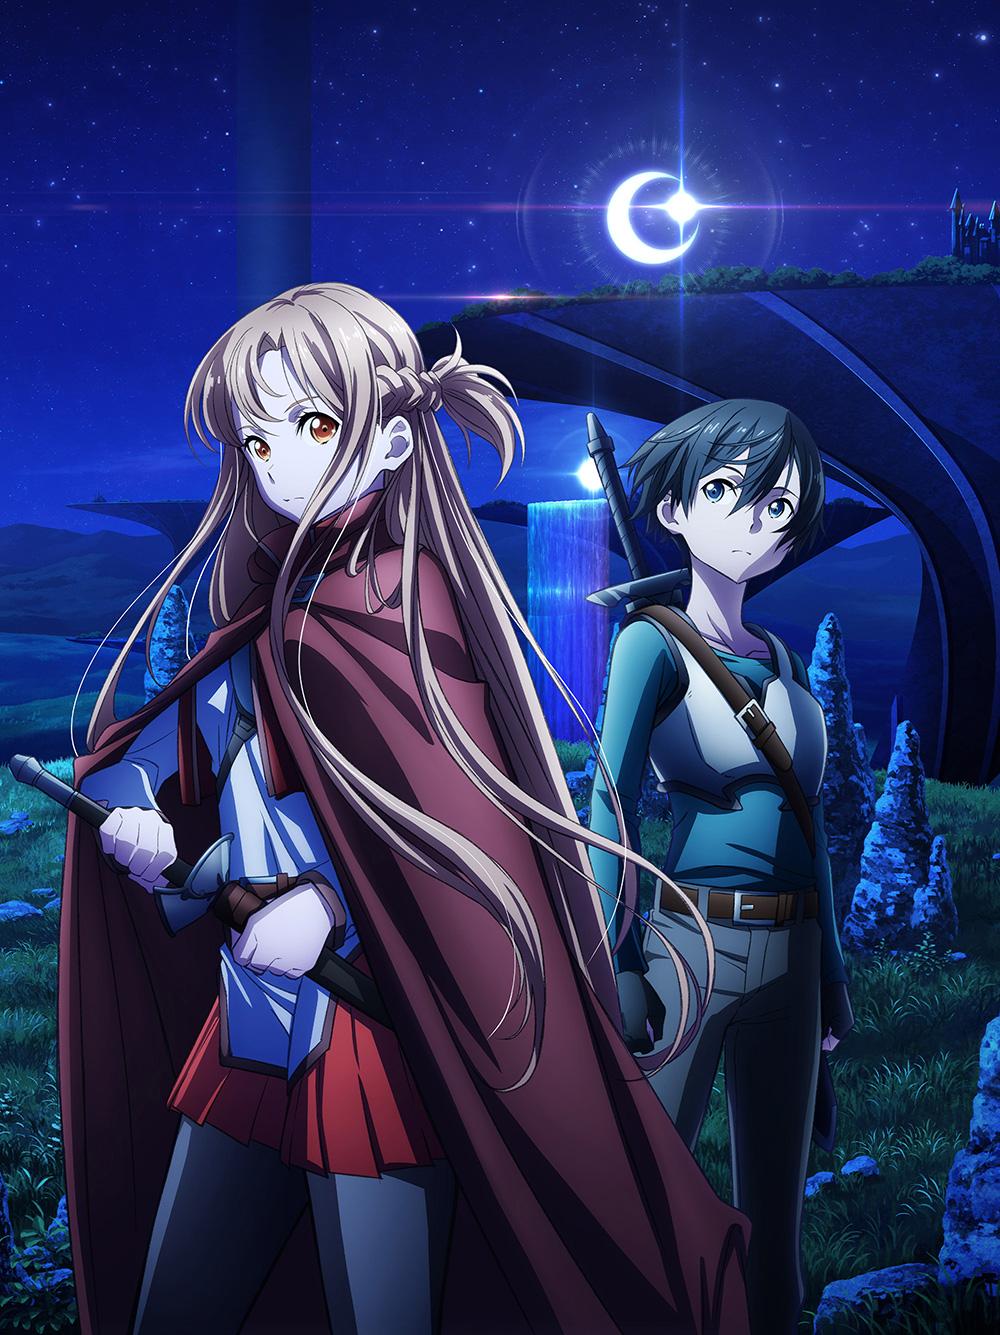 Sword-Art-Online-Progressive-Aria-of-a-Starless-Night-Visual